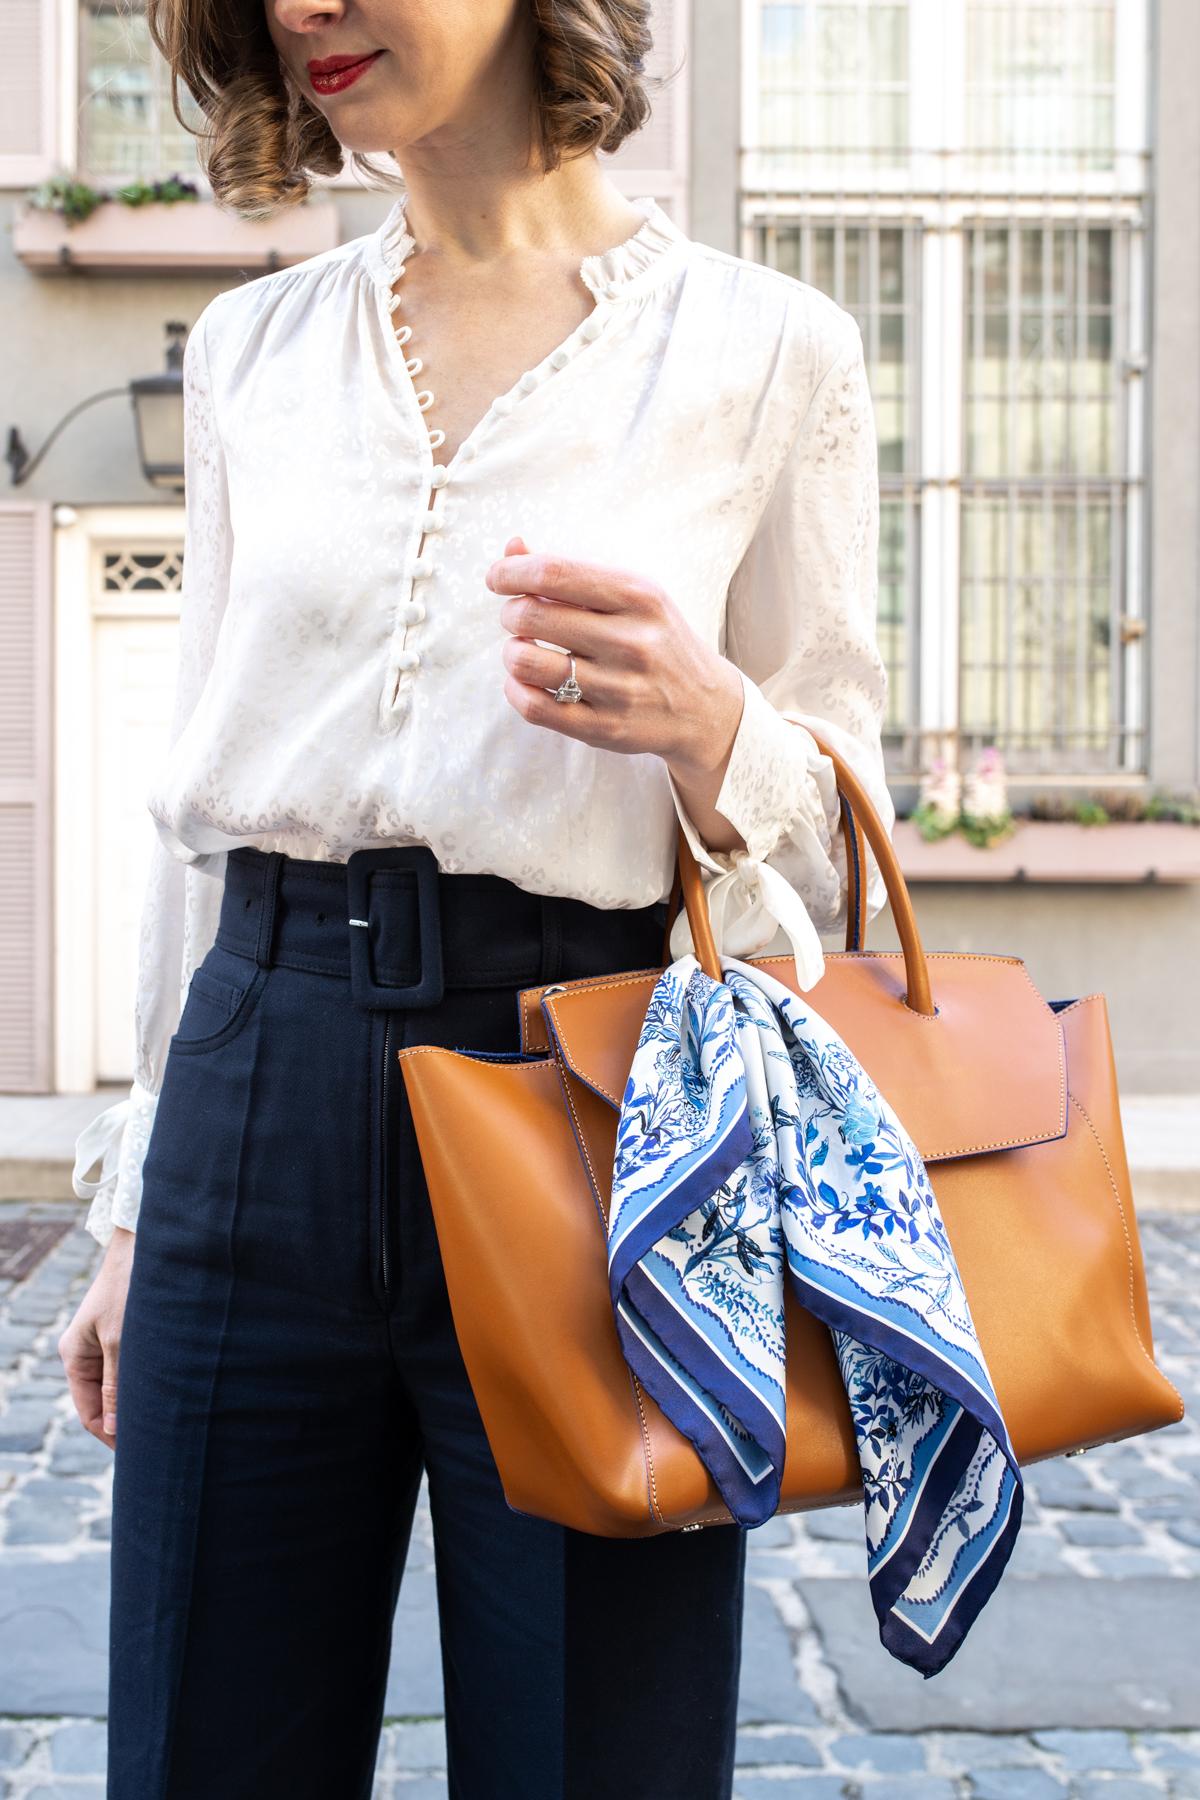 Stacie Flinner How to Style a Silk Scarf-6.jpg